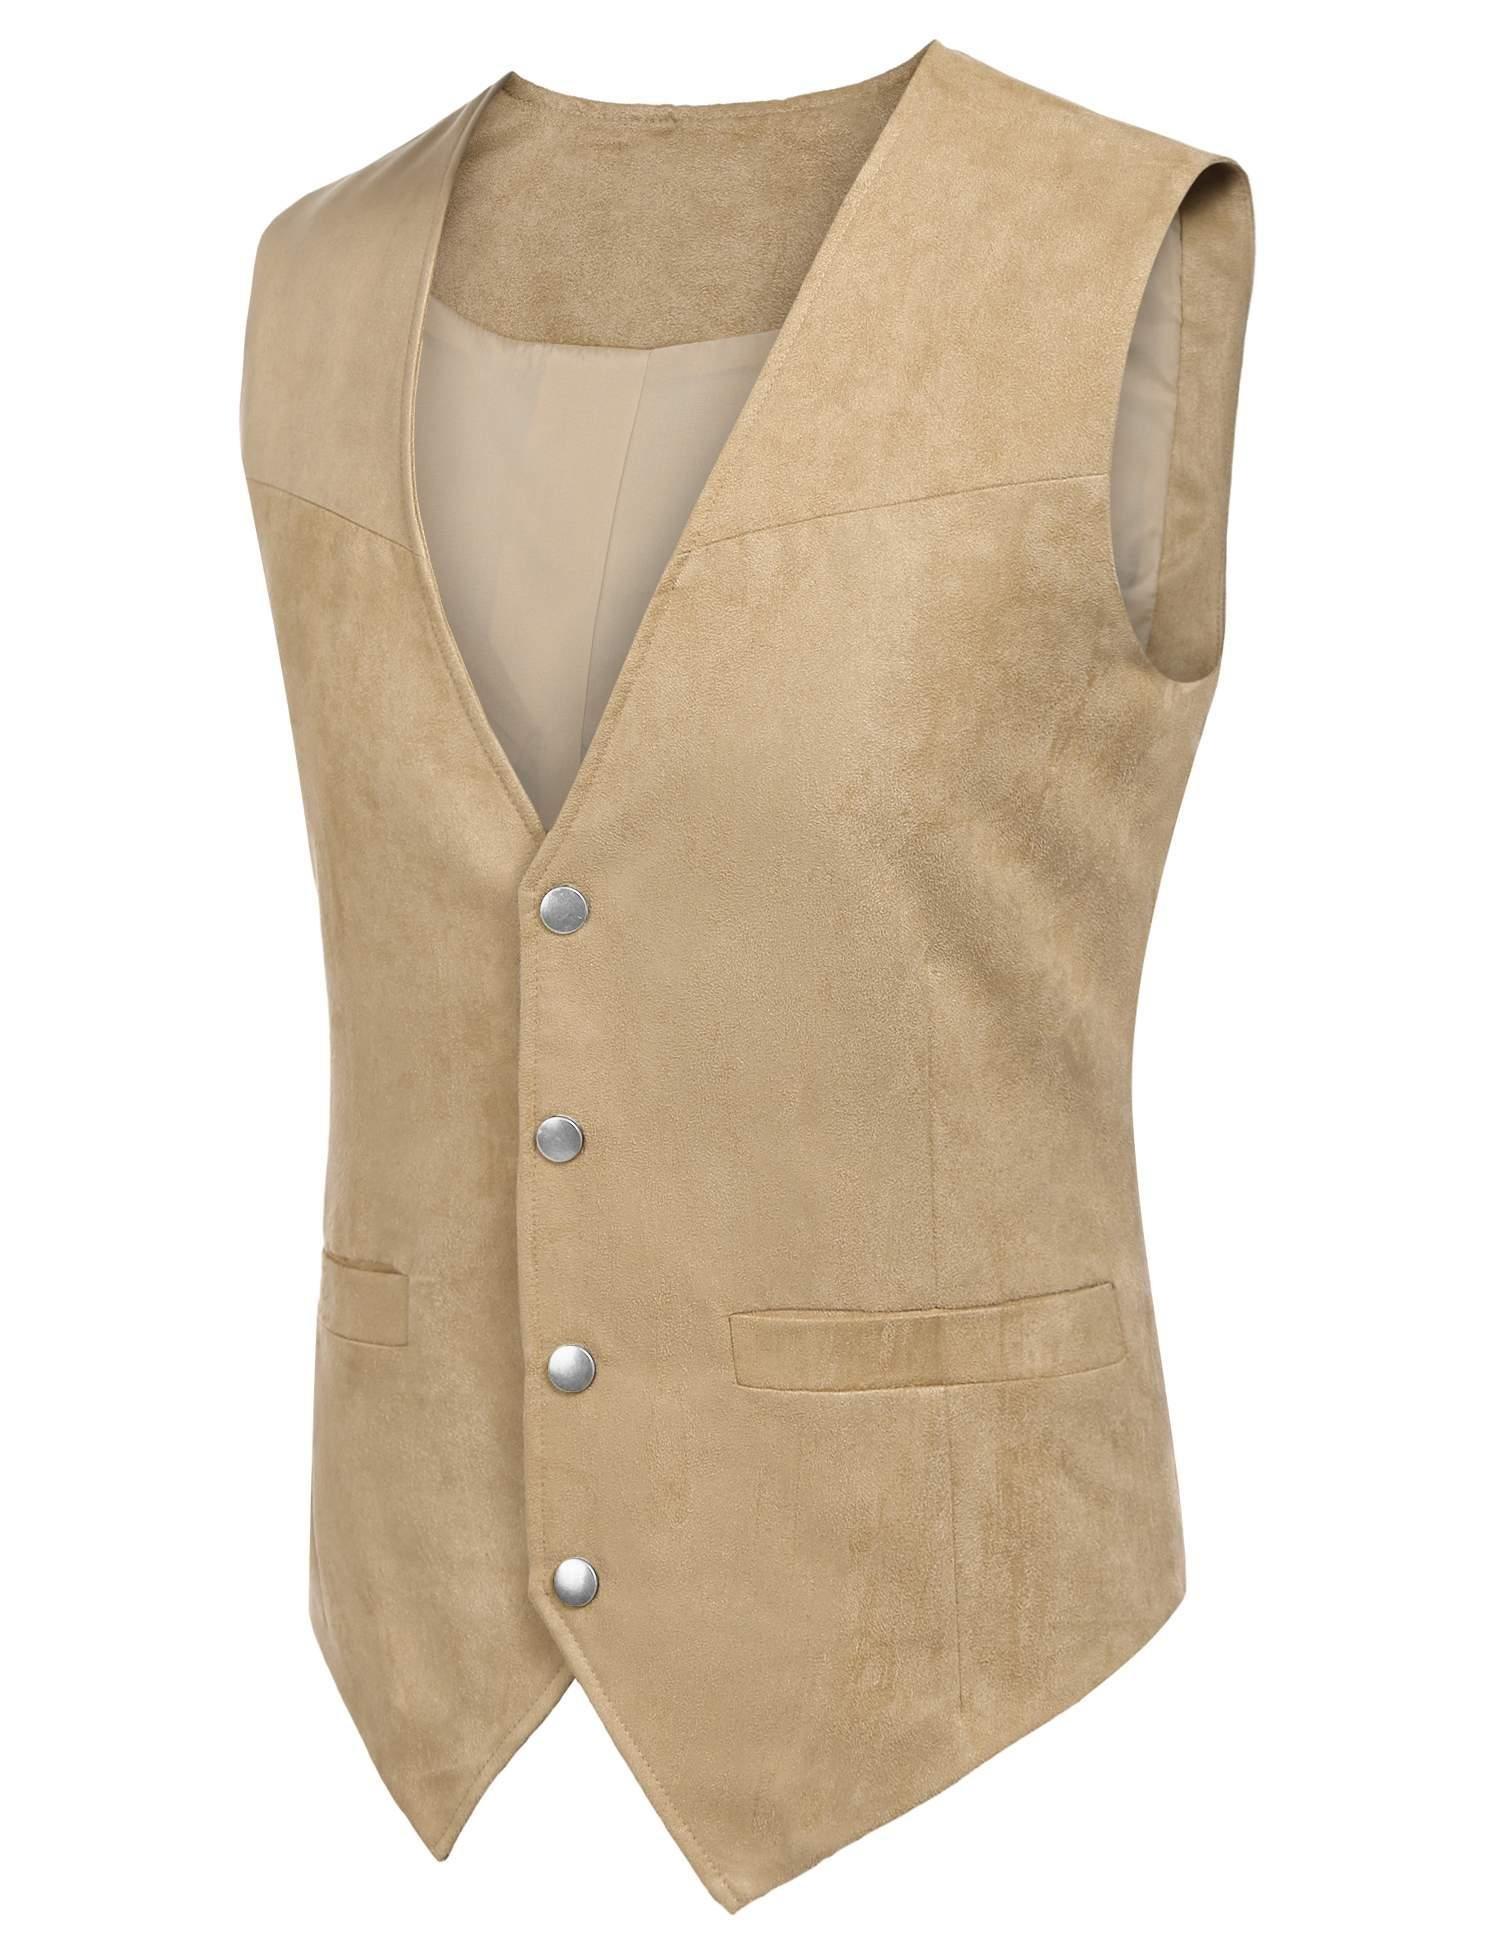 Edited Mens Faux Suede Vest Dress Suit Vest Formal Waistcoat for Wedding